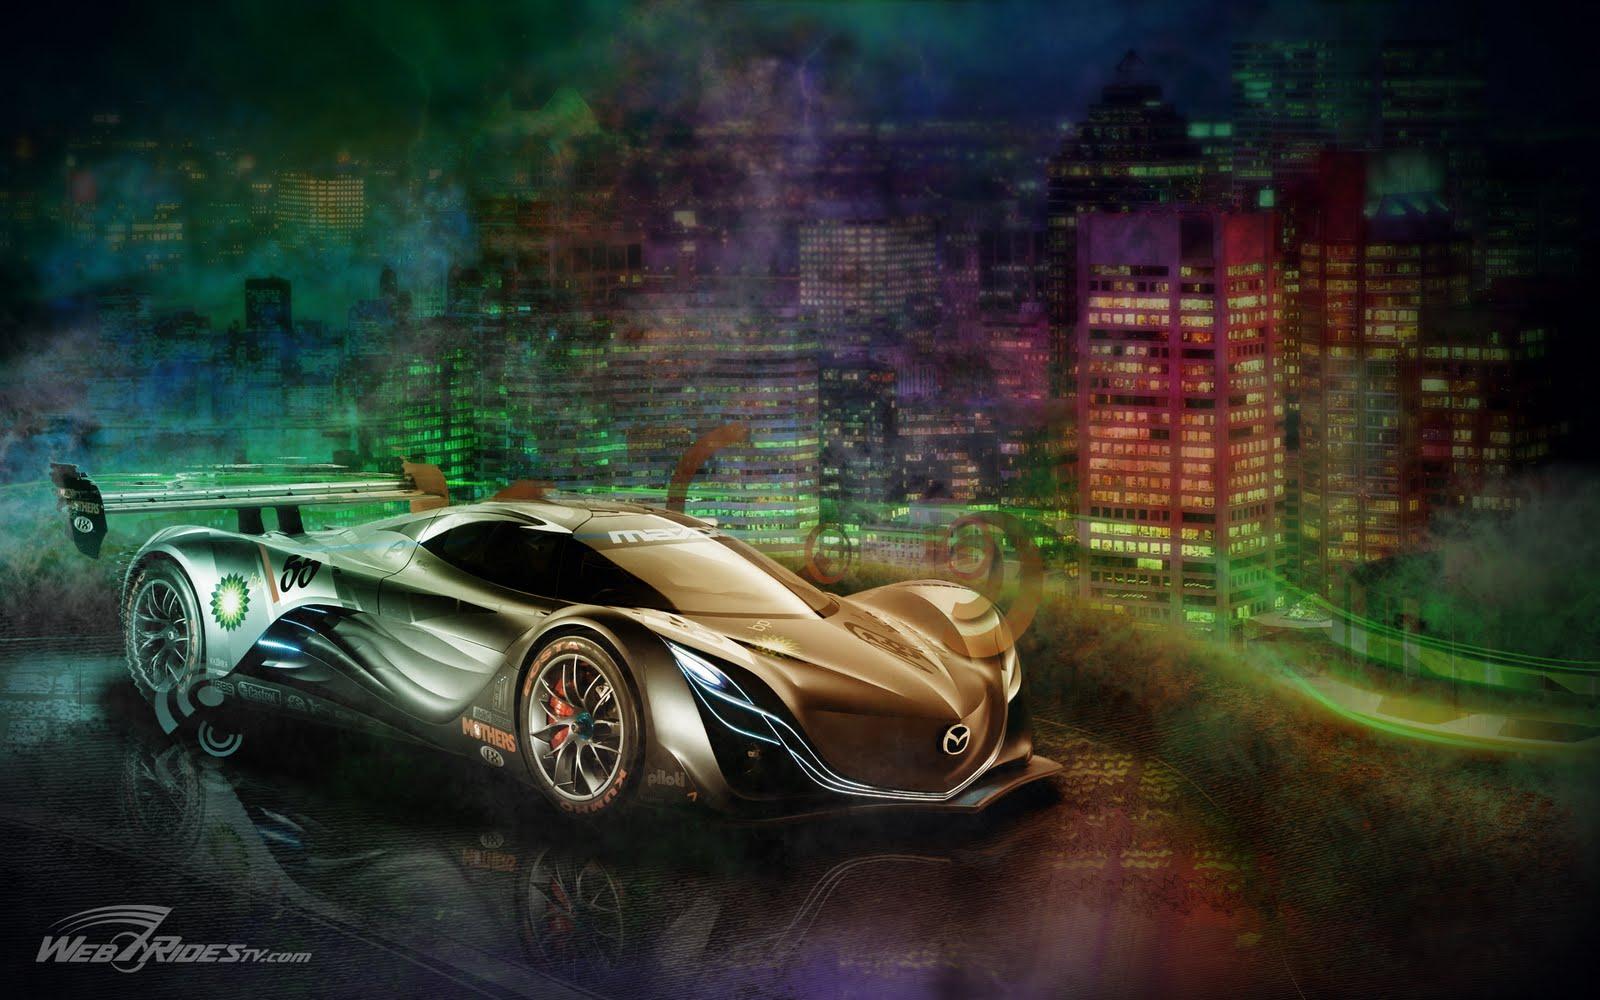 https://2.bp.blogspot.com/_2UbsSBz9ckE/Svw1M8dY5lI/AAAAAAAAAcs/X7xeAjrxqx8/s1600/Mazda_Furai_concept_hd_wallpaper_2.jpg